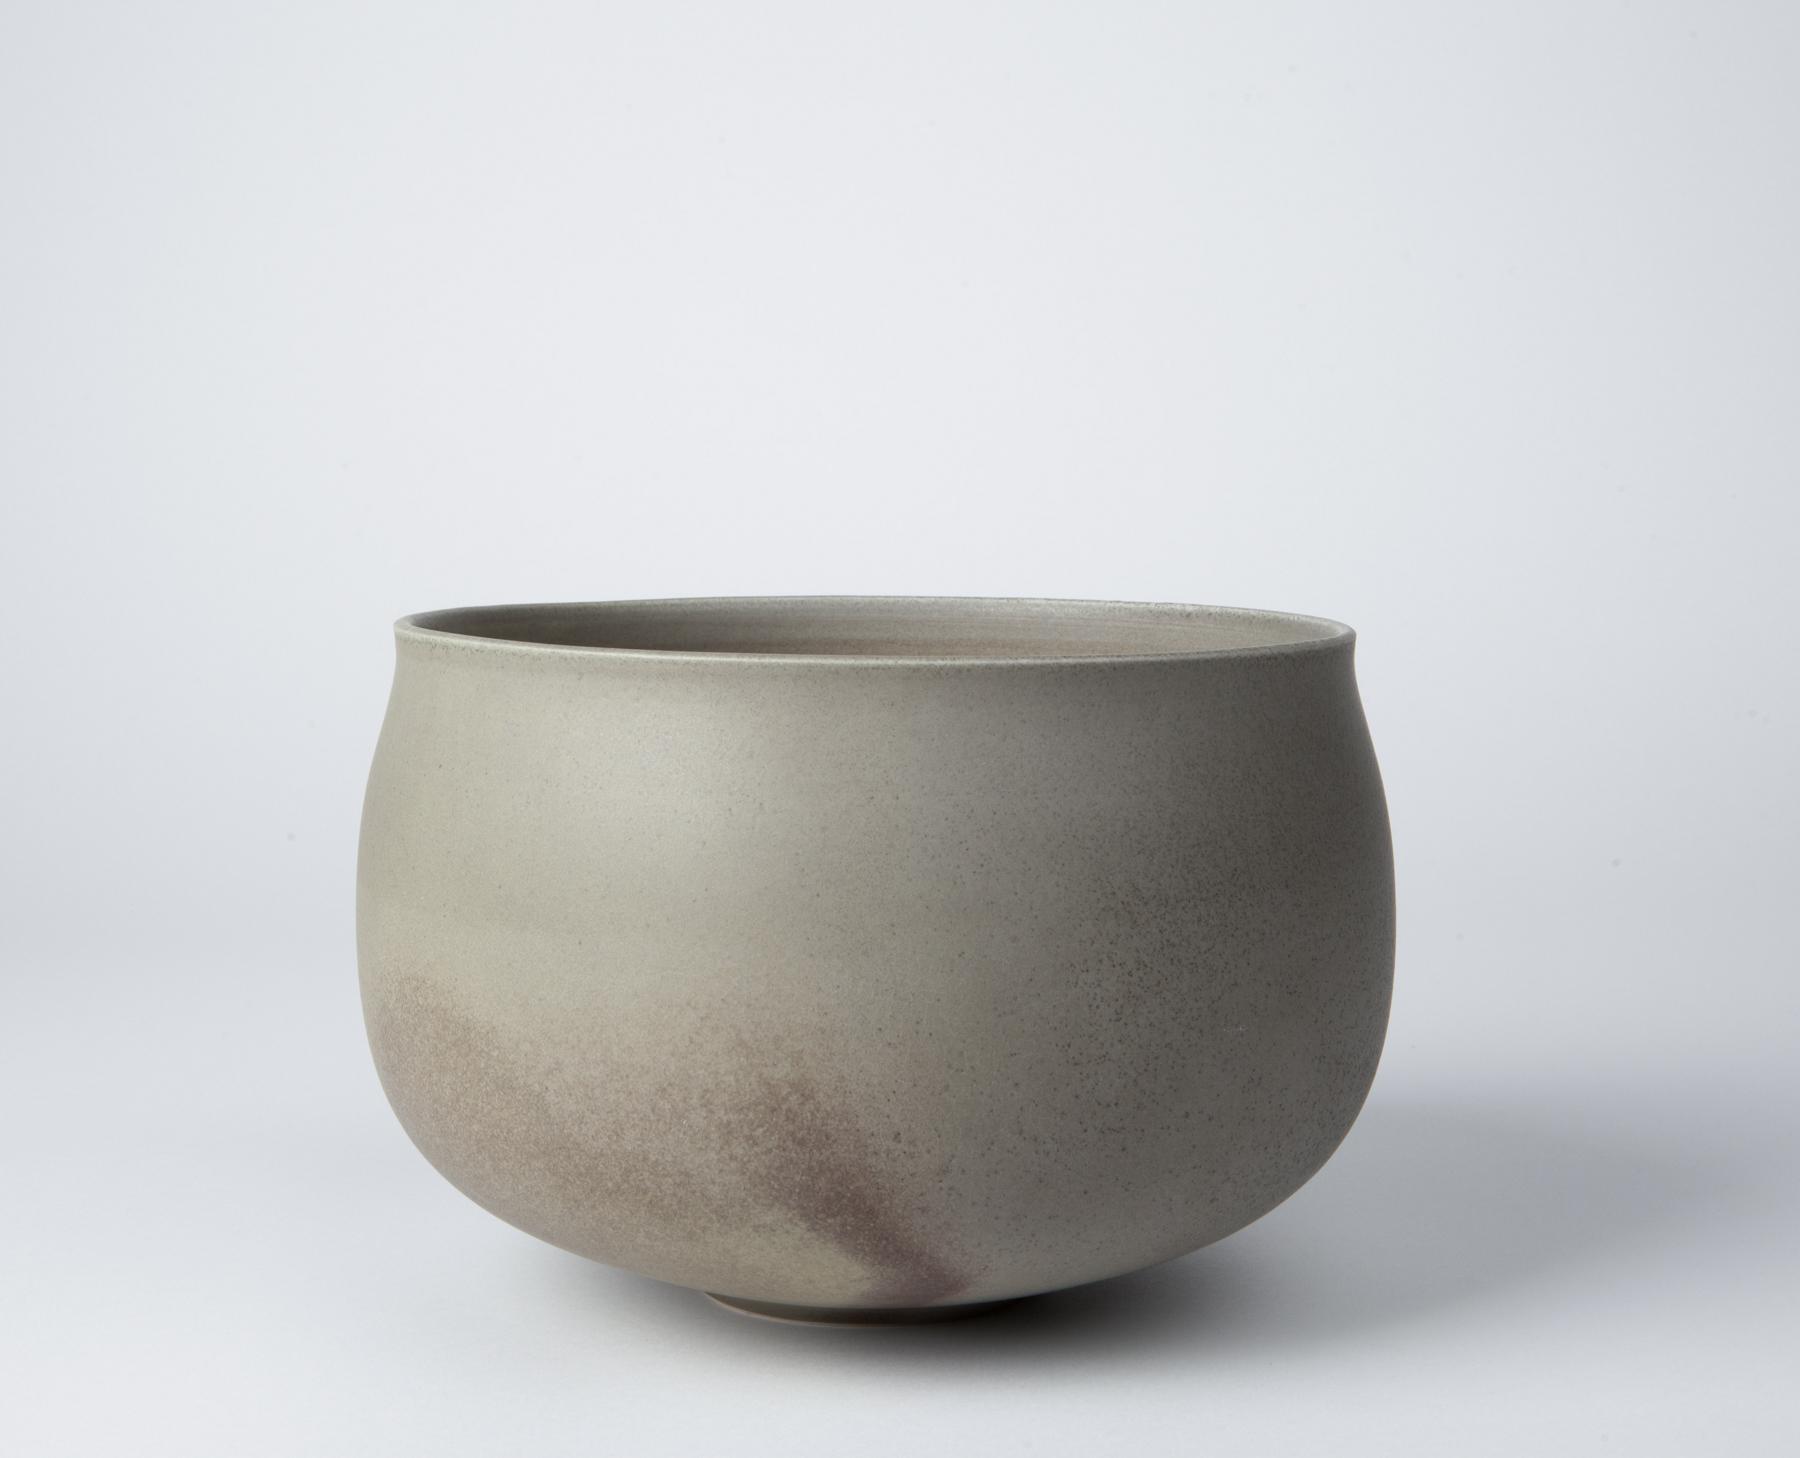 large fog bowl, cone 9 reduction porcelain